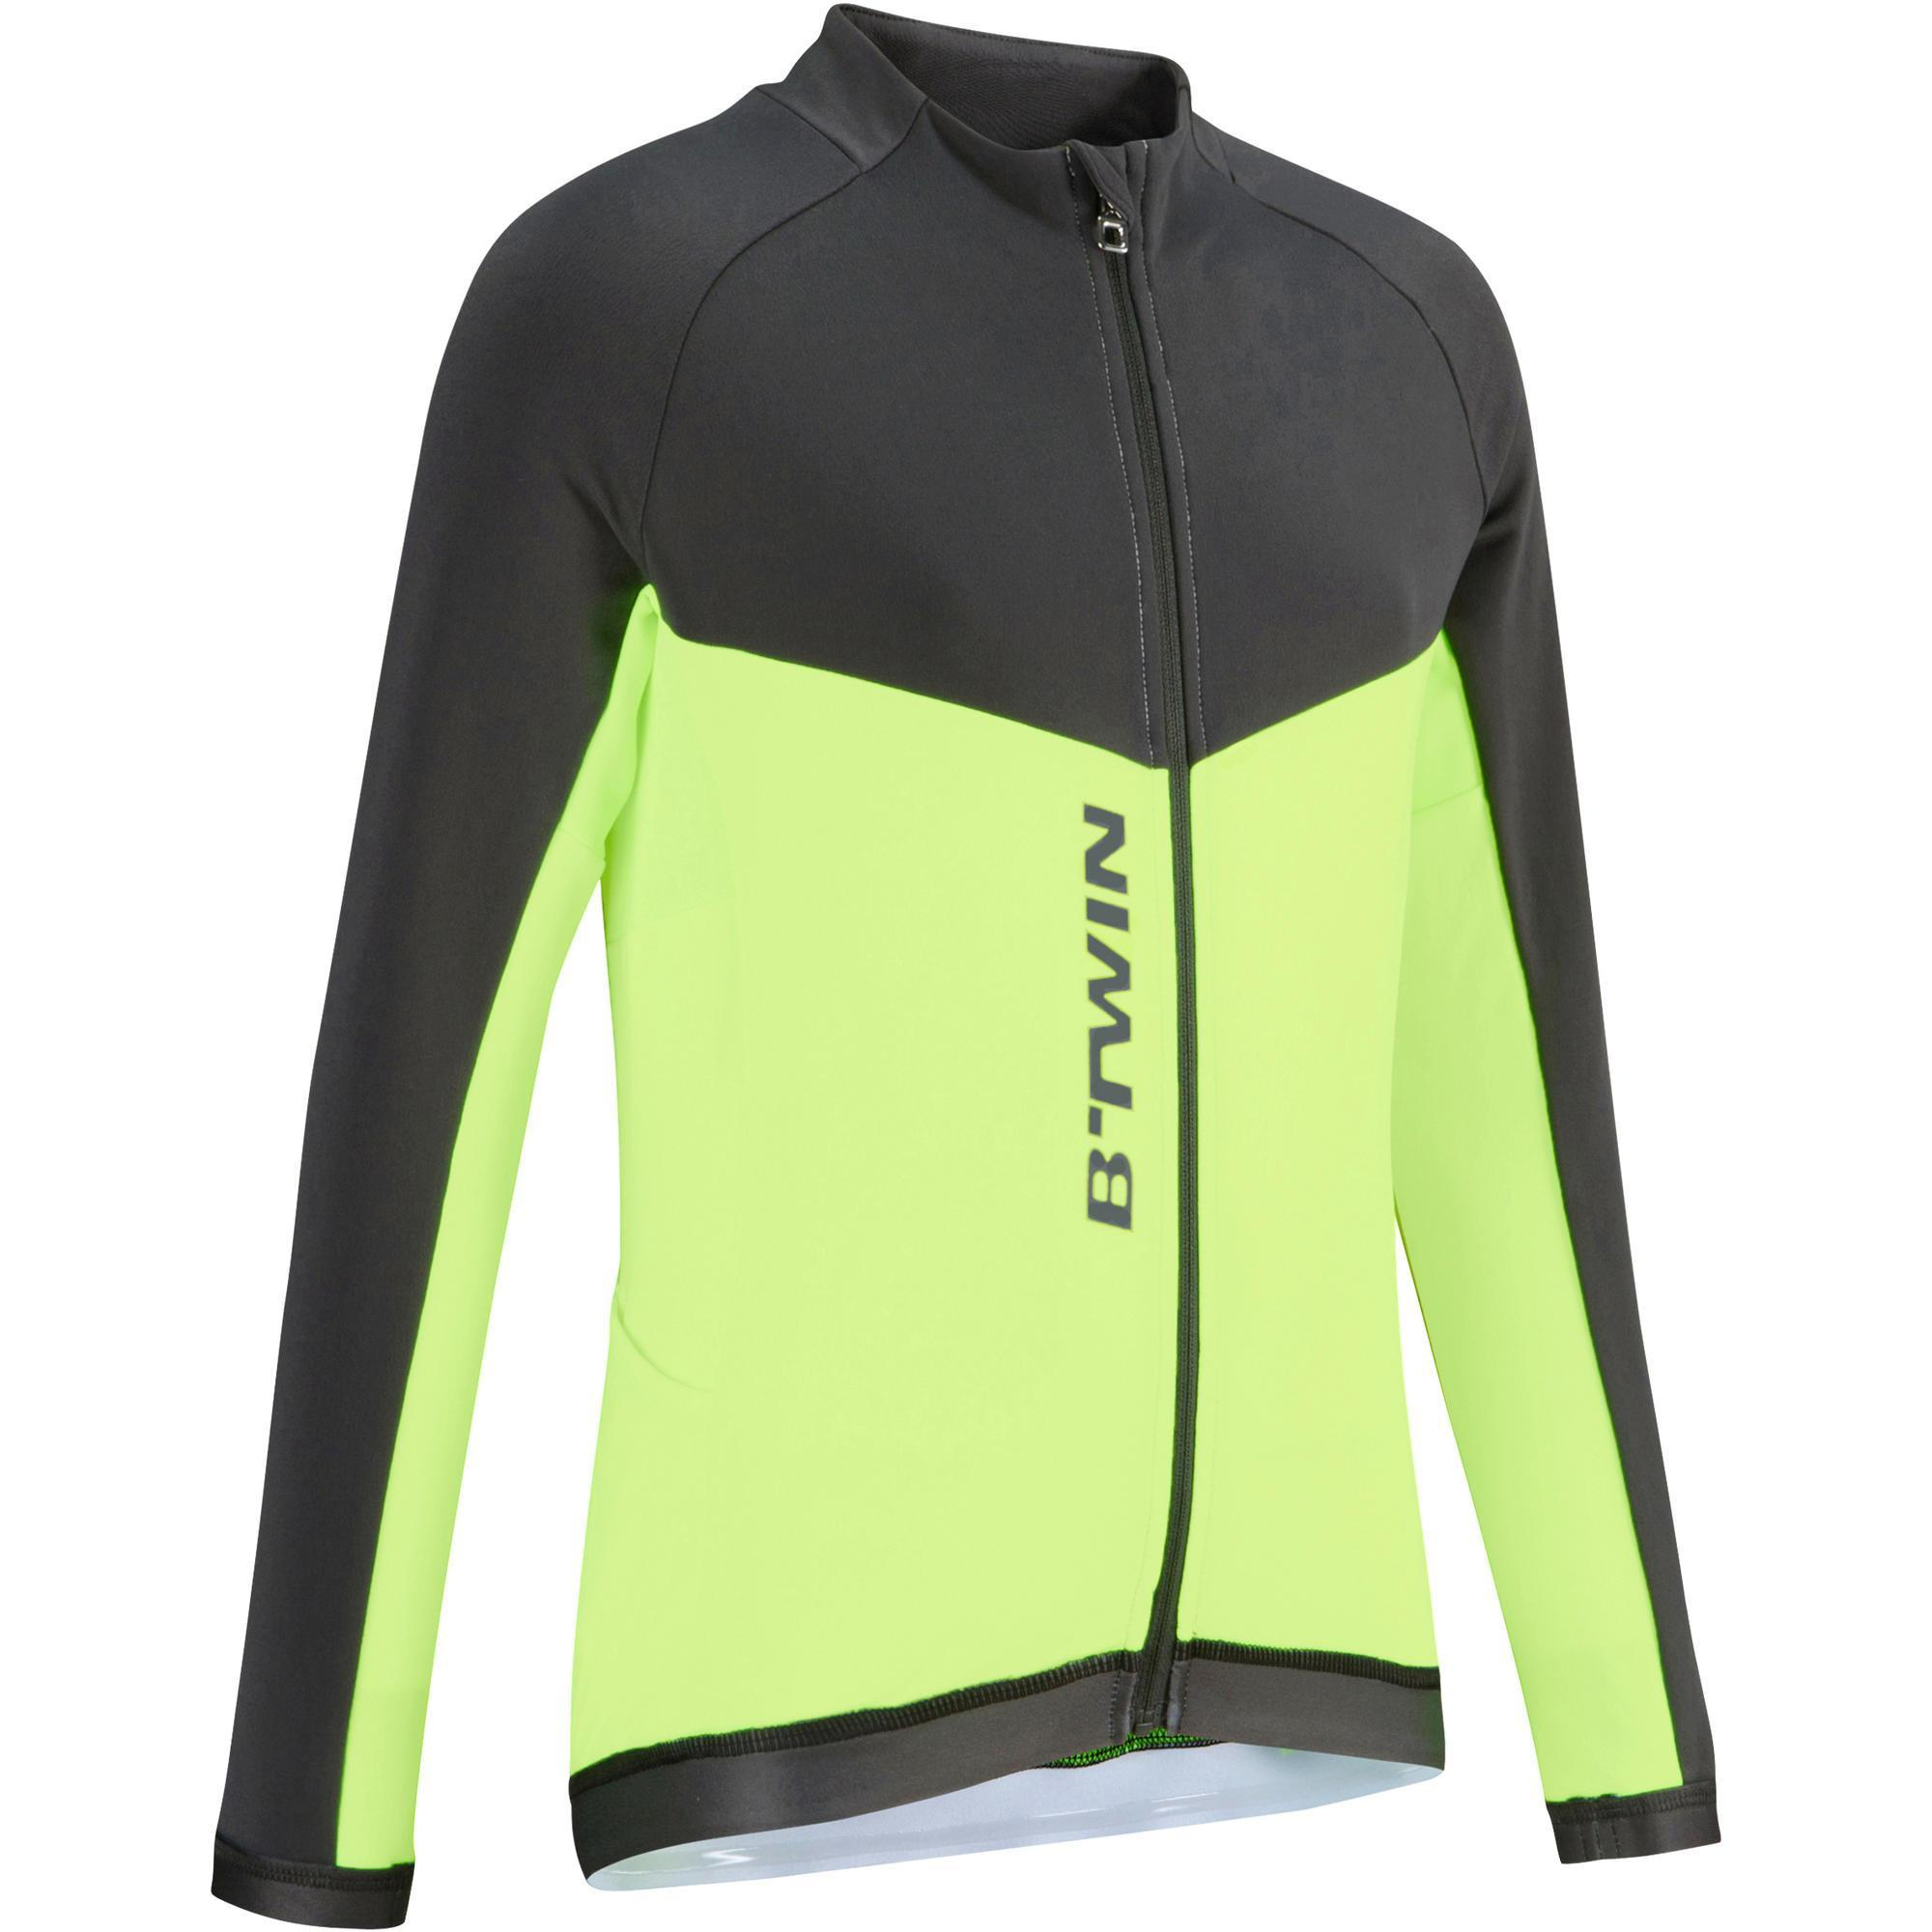 Langarm-Fahrradtrikot 900 Kinder gelb | Sportbekleidung > Trikots | B´twin